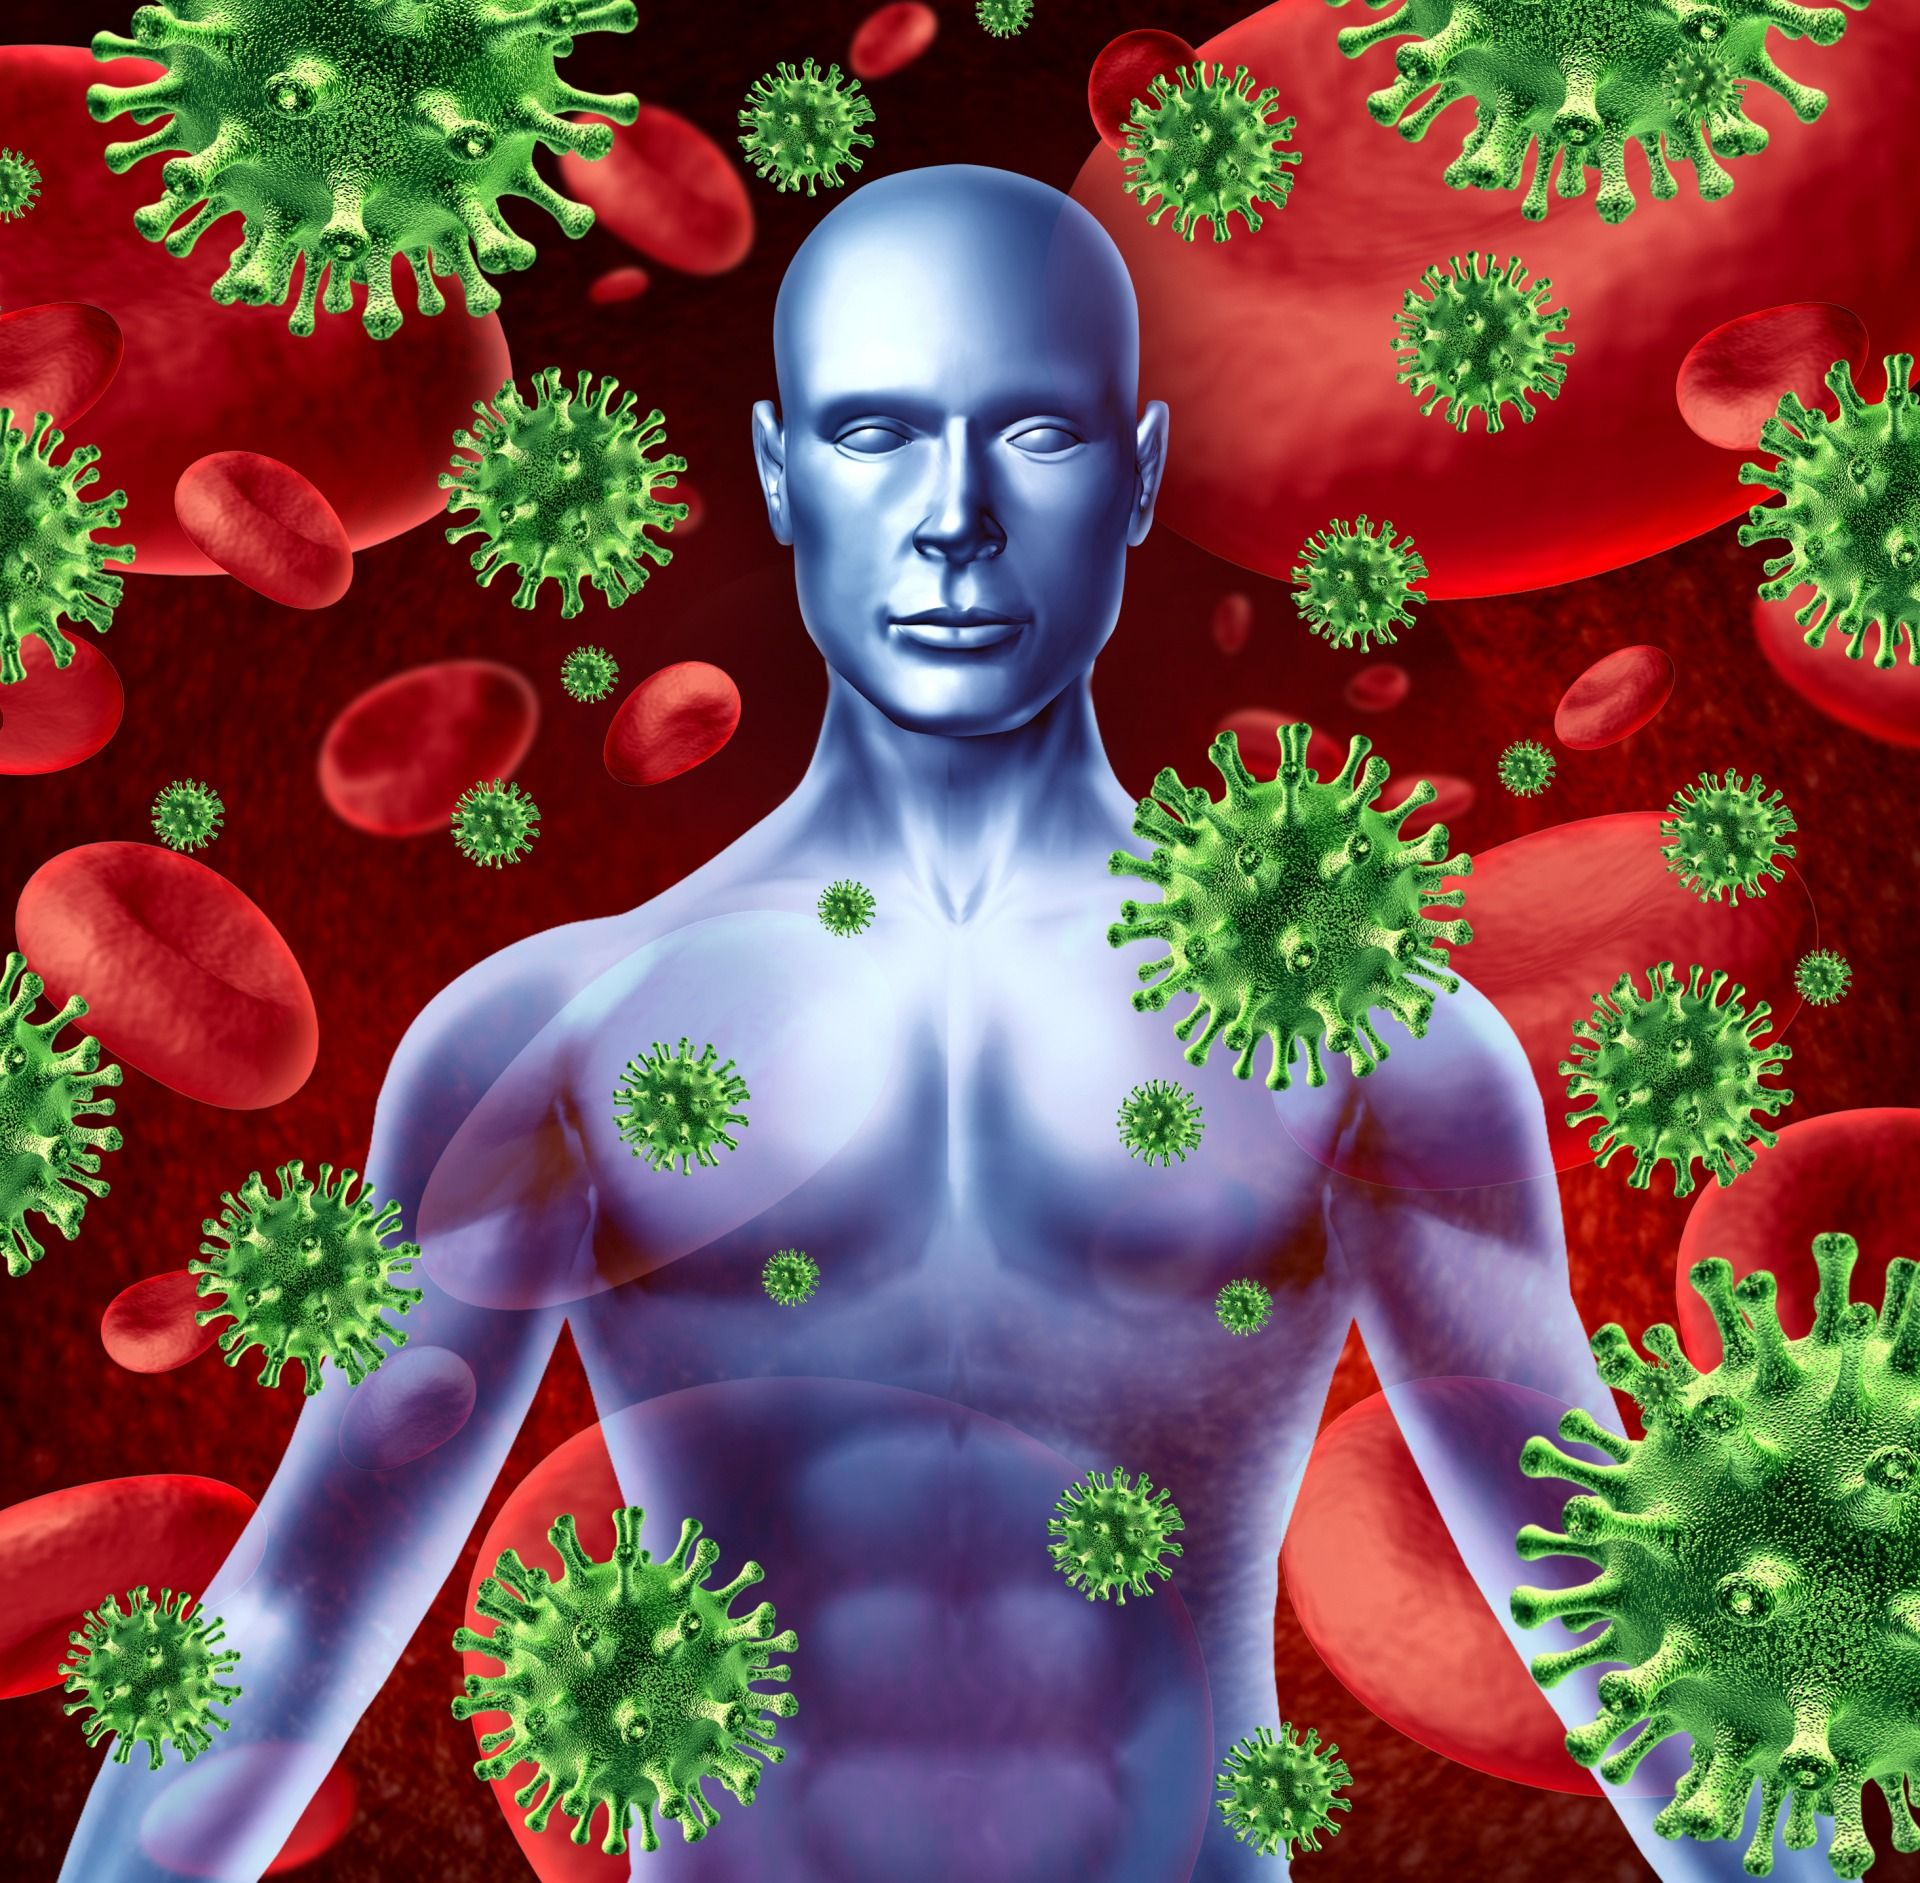 Krankheitserreger im Blut